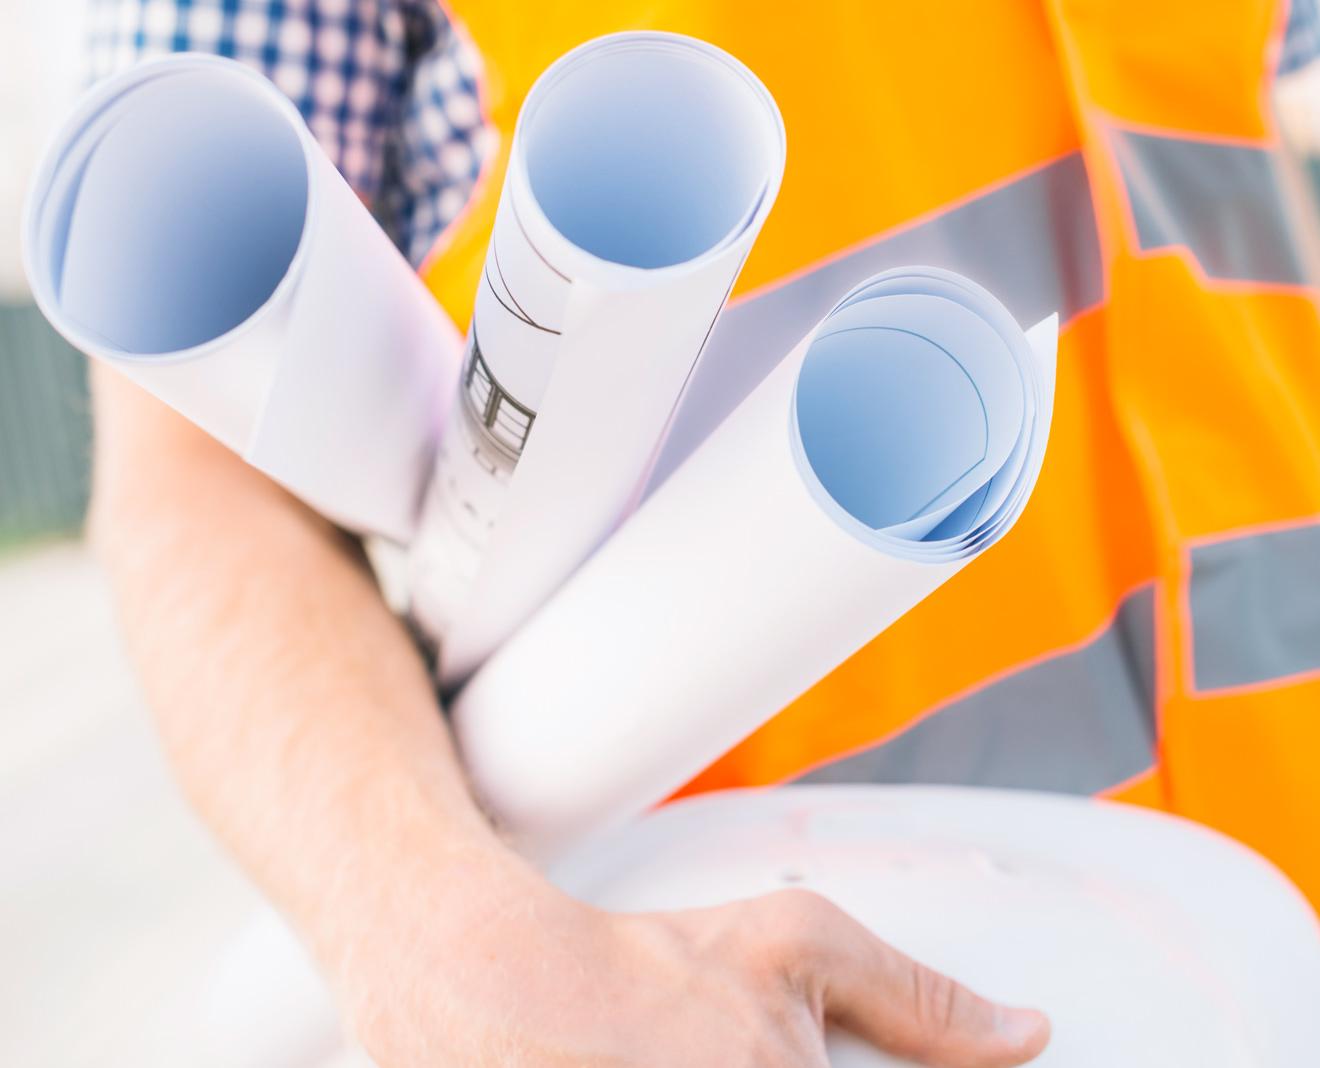 Building Regulations in Architectural Design